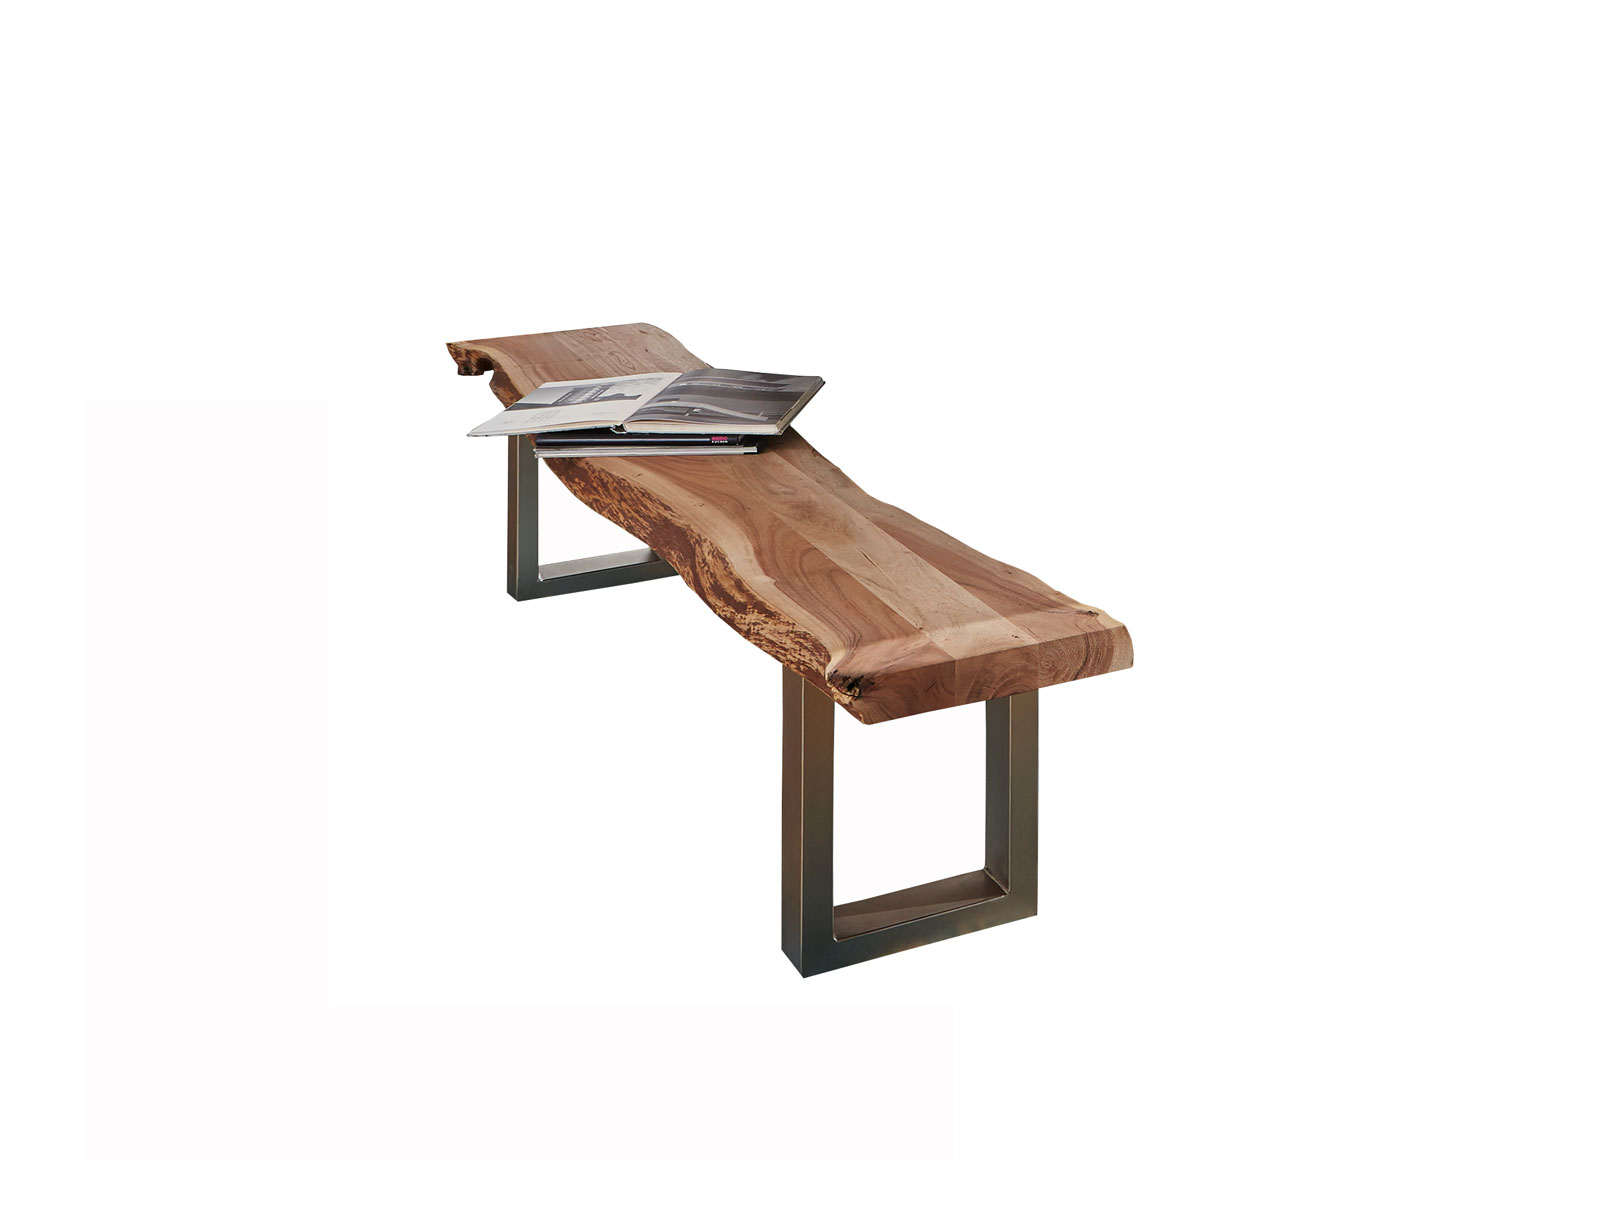 sam® sitzbank holz massiv baumkante 195 x 38 x 45 cm akazie madras